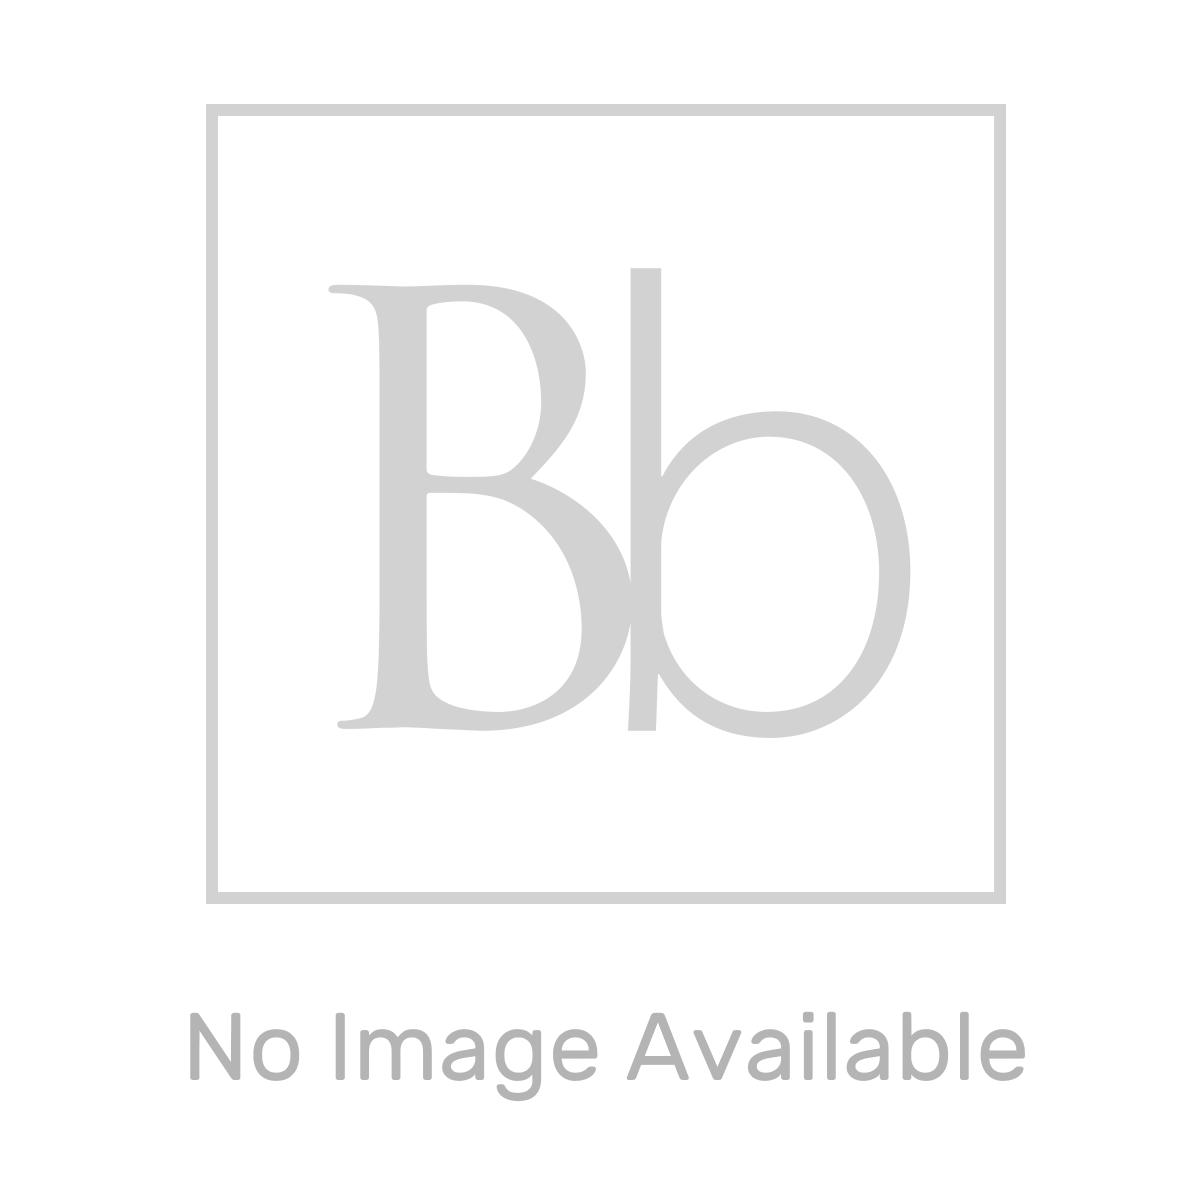 BTL Amyris Back To Wall Toilet